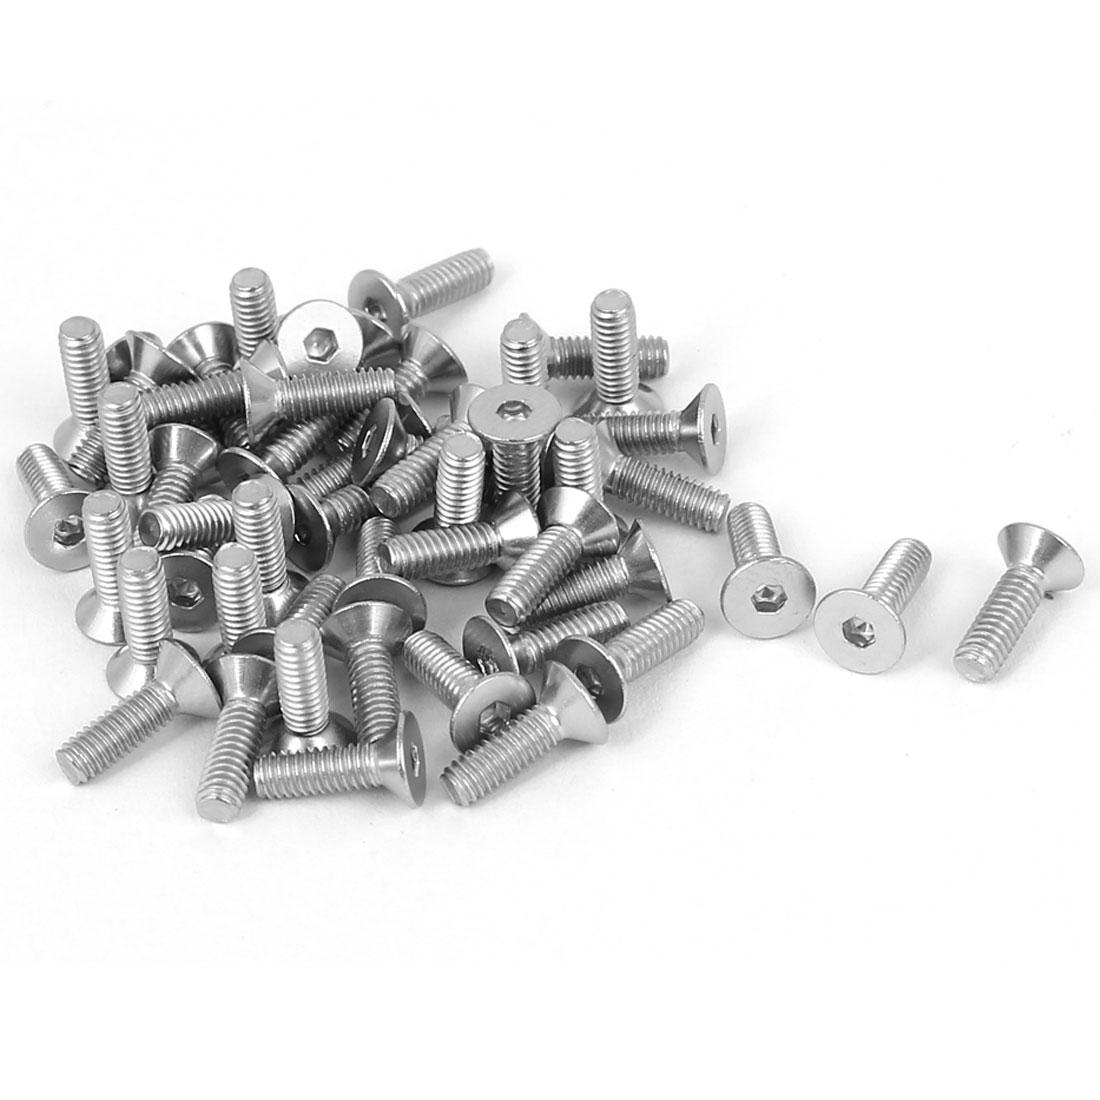 M2.5x8mm Stainless Steel Hex Socket Flat Head Countersunk Bolts Screw 50pcs